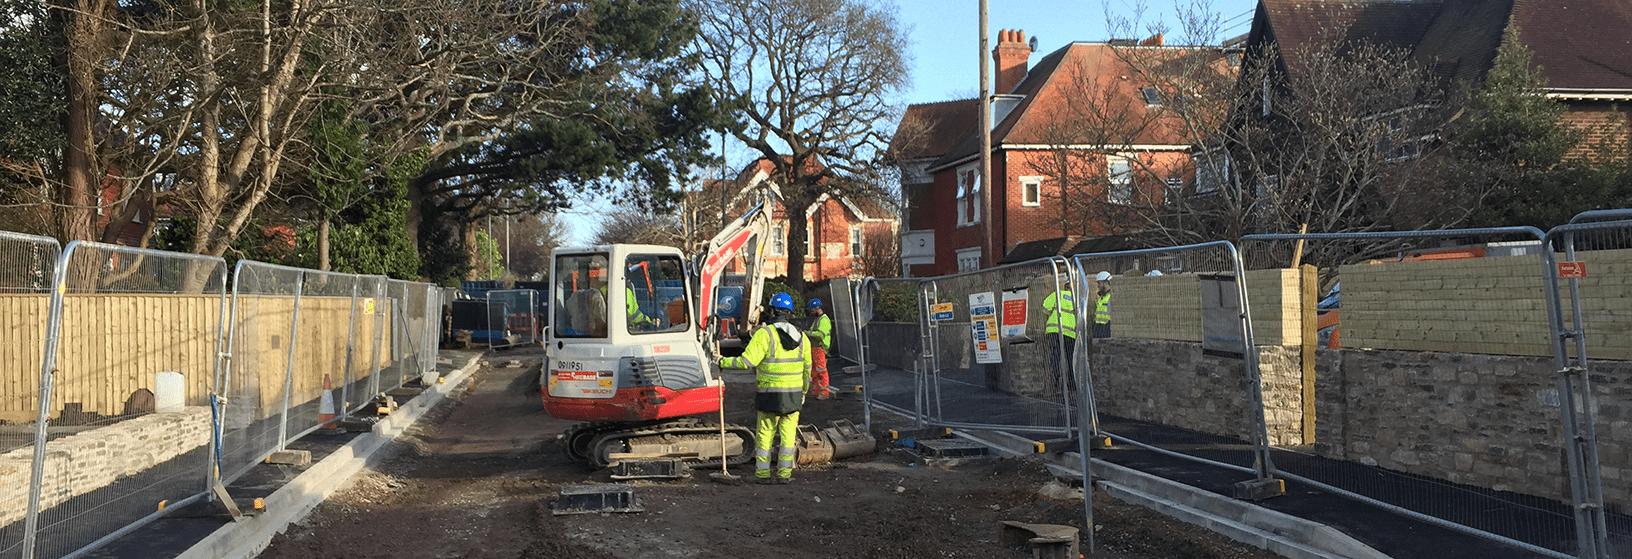 Mini excavator in road in suburban street